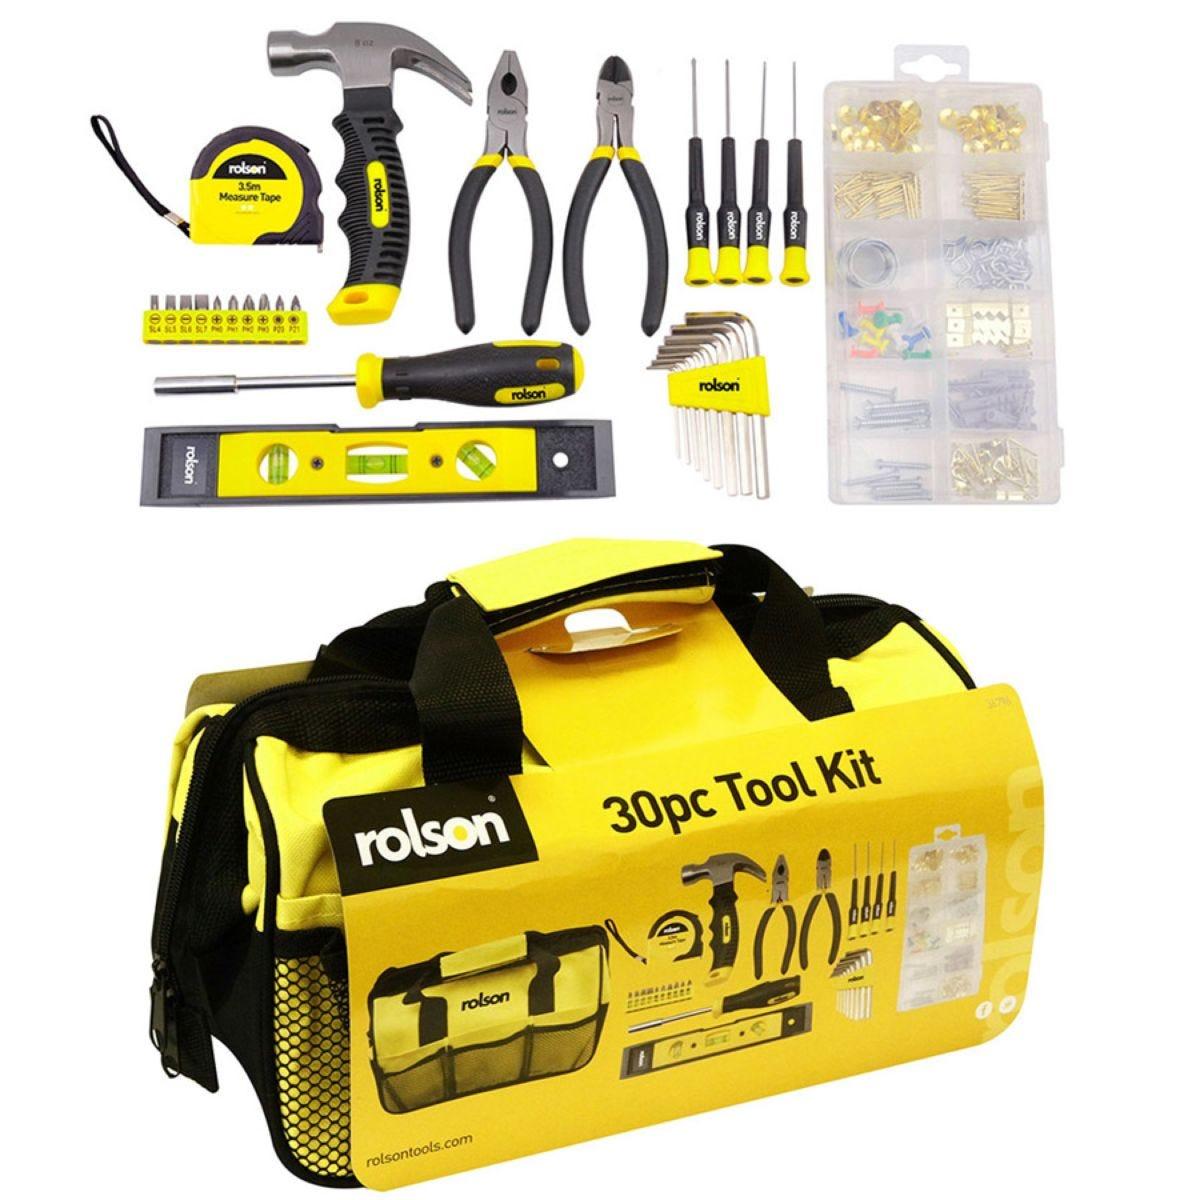 Rolson 30-Piece Tool Kit